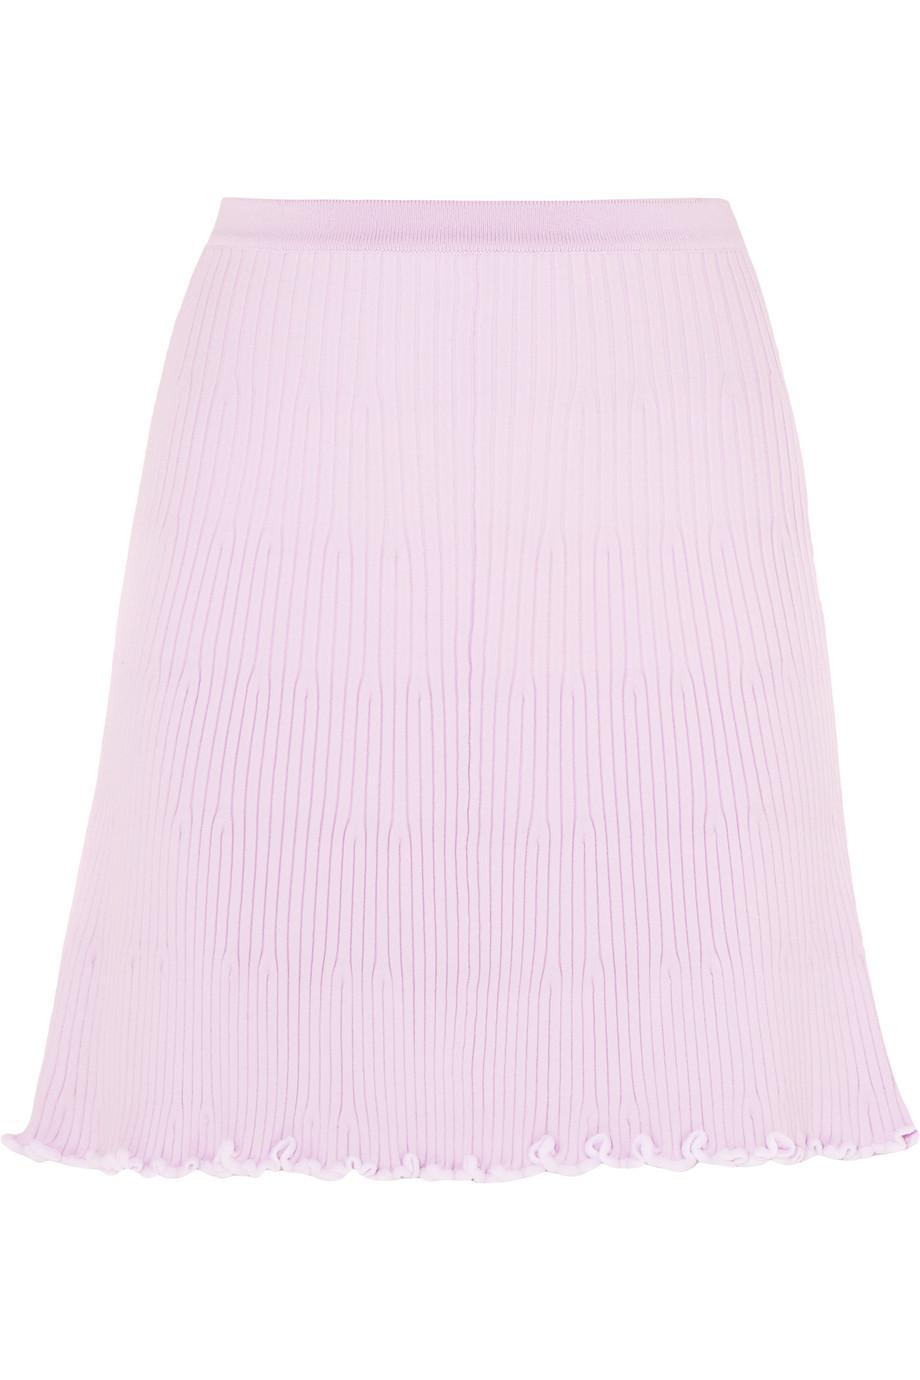 J.W.Anderson Ruffled Ribbed-Knit Mini Skirt, Size: L